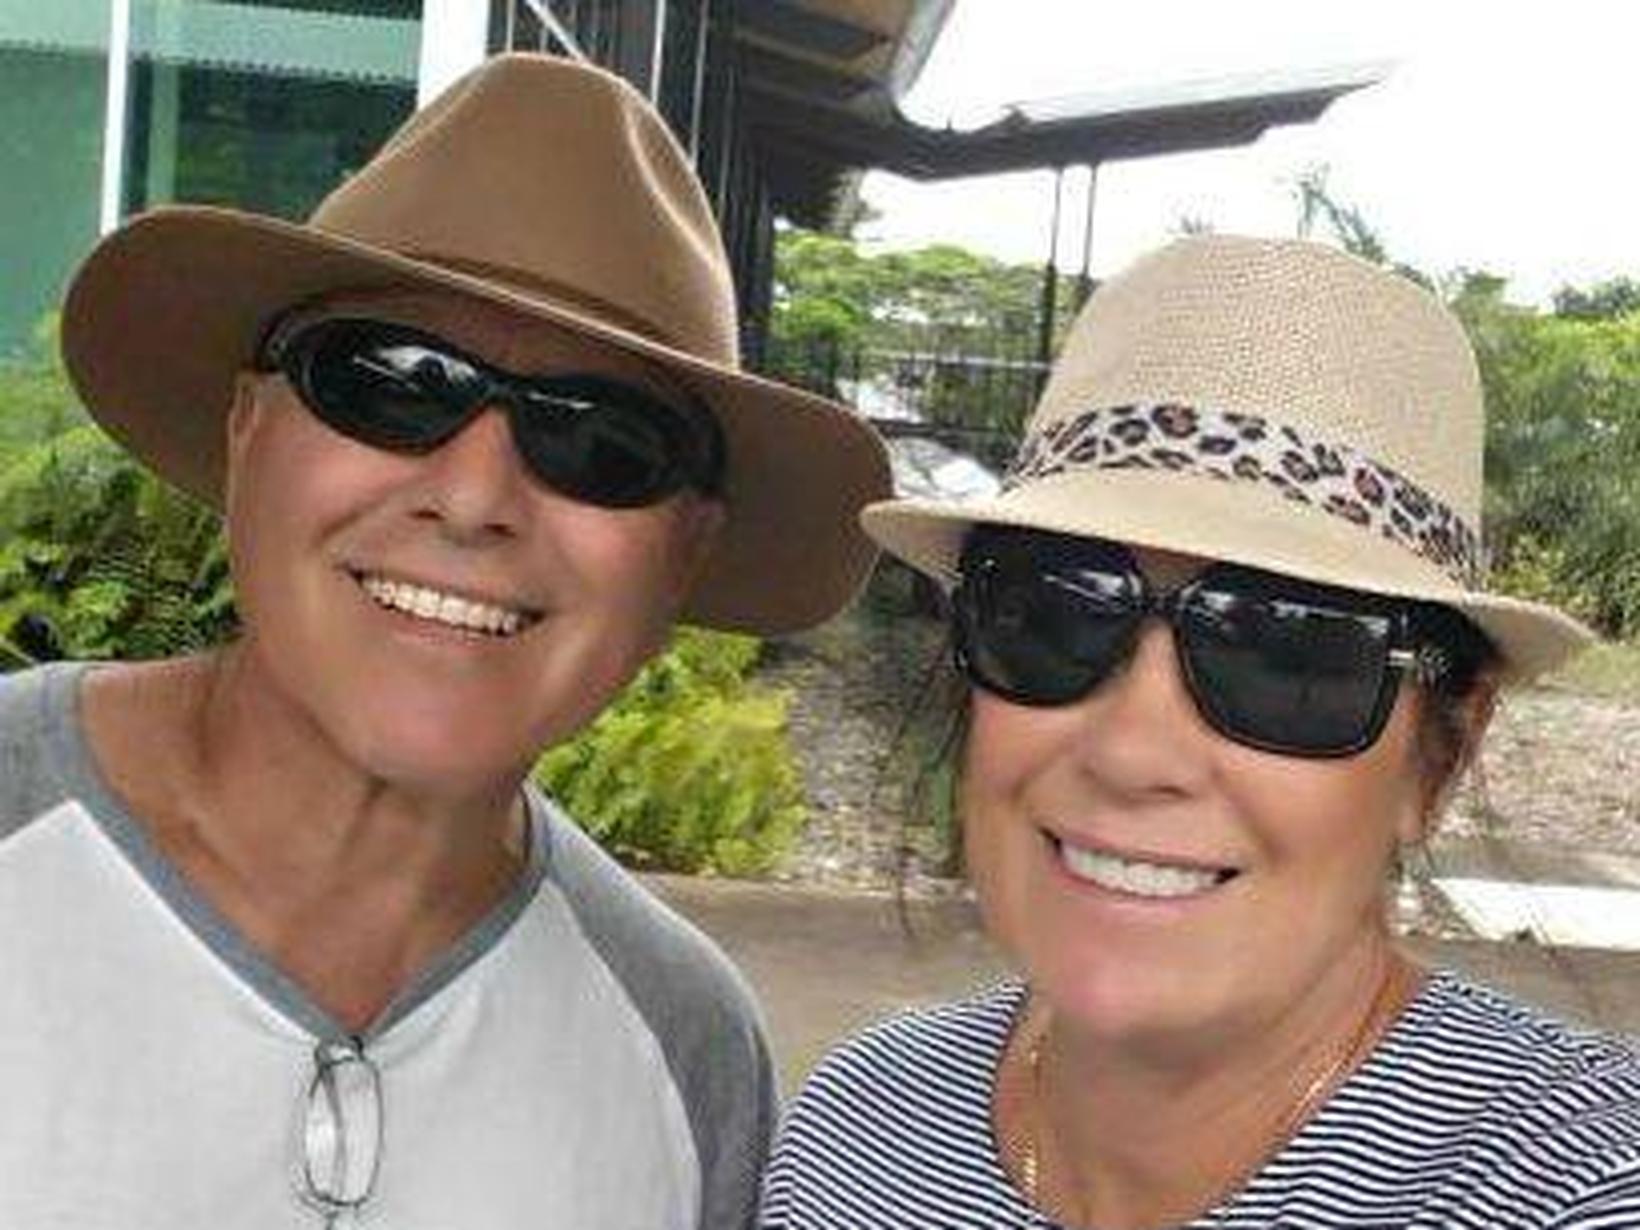 Rick & trish & Rick from Gold Coast, Queensland, Australia